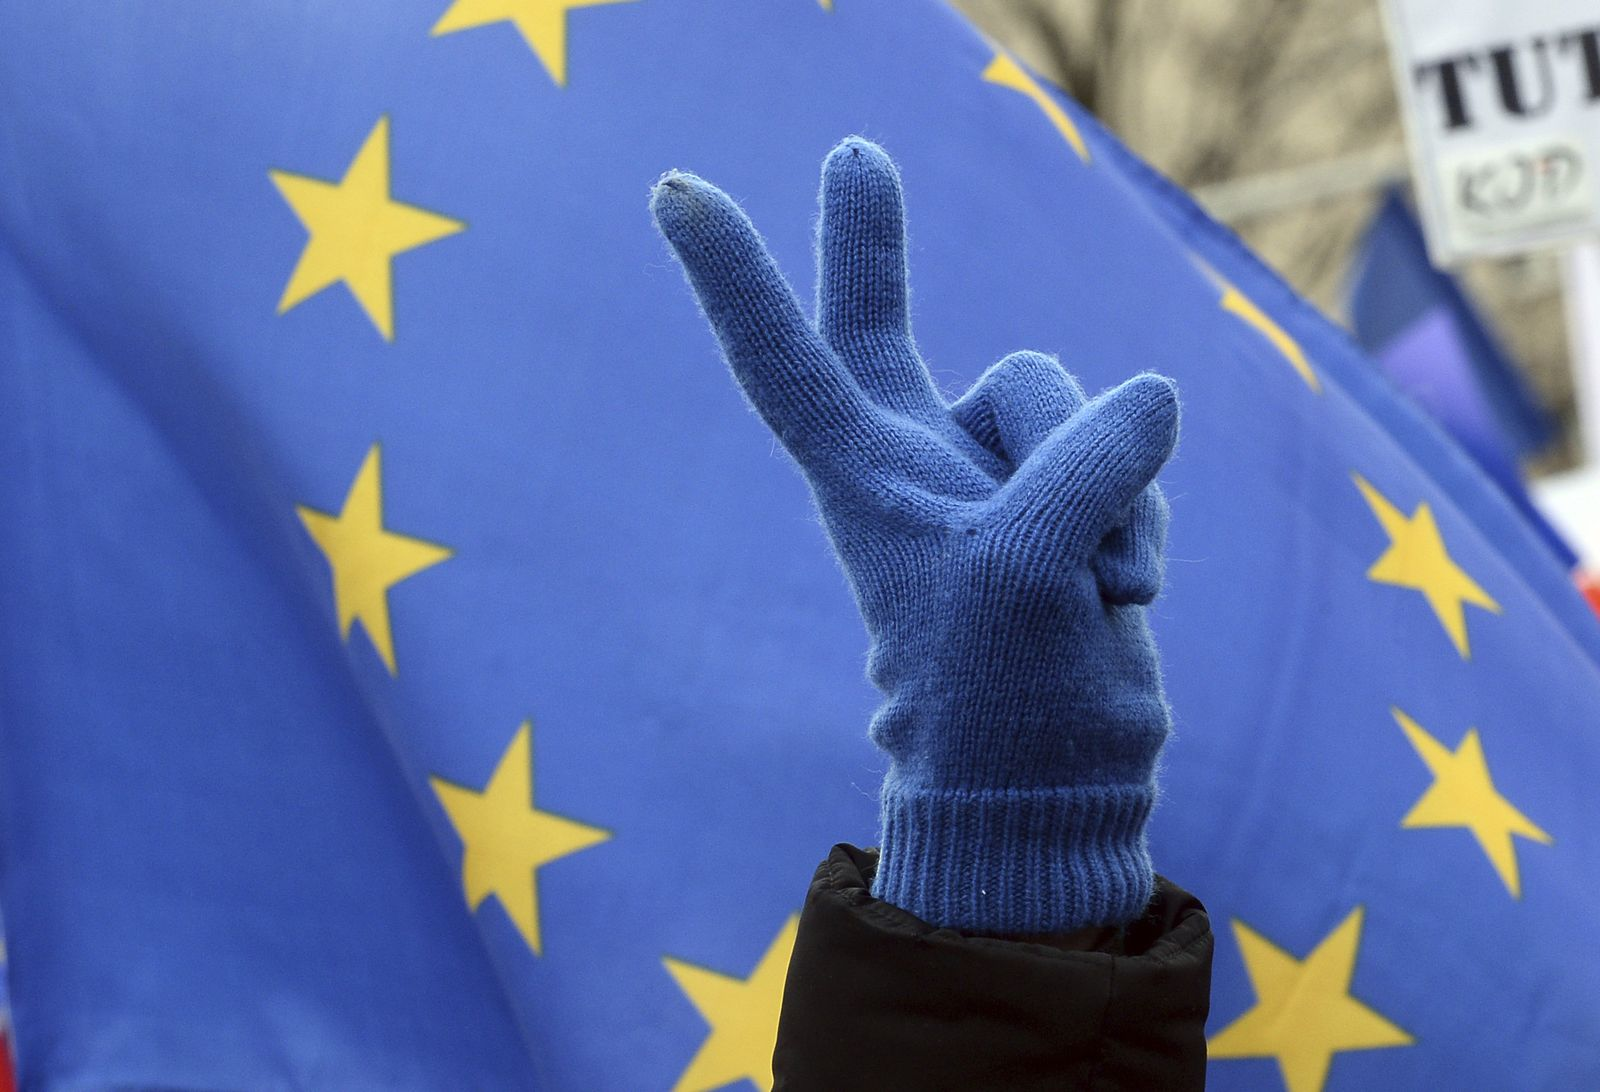 Europa/ Peace/ Hand